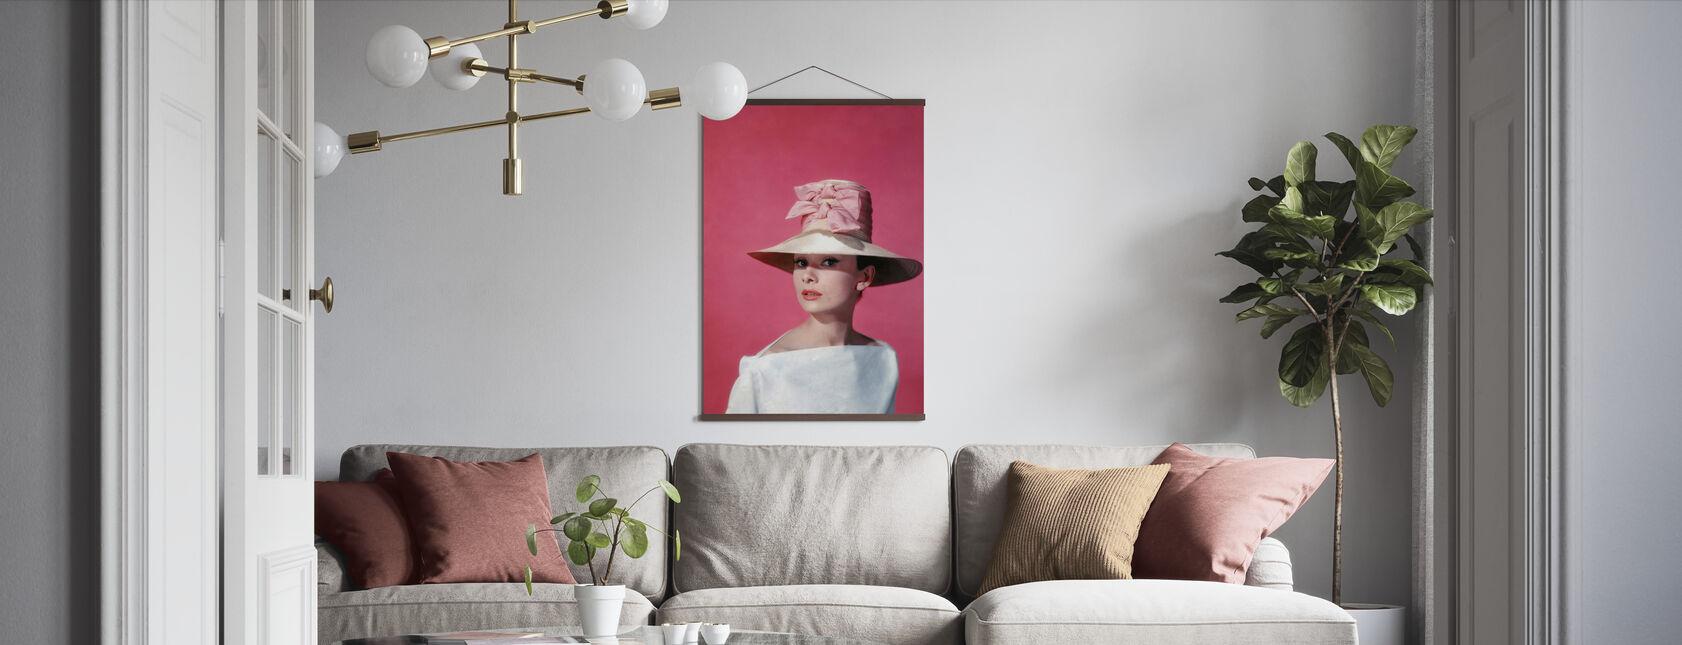 Audrey Hepburn in Funny Face - Poster - Living Room